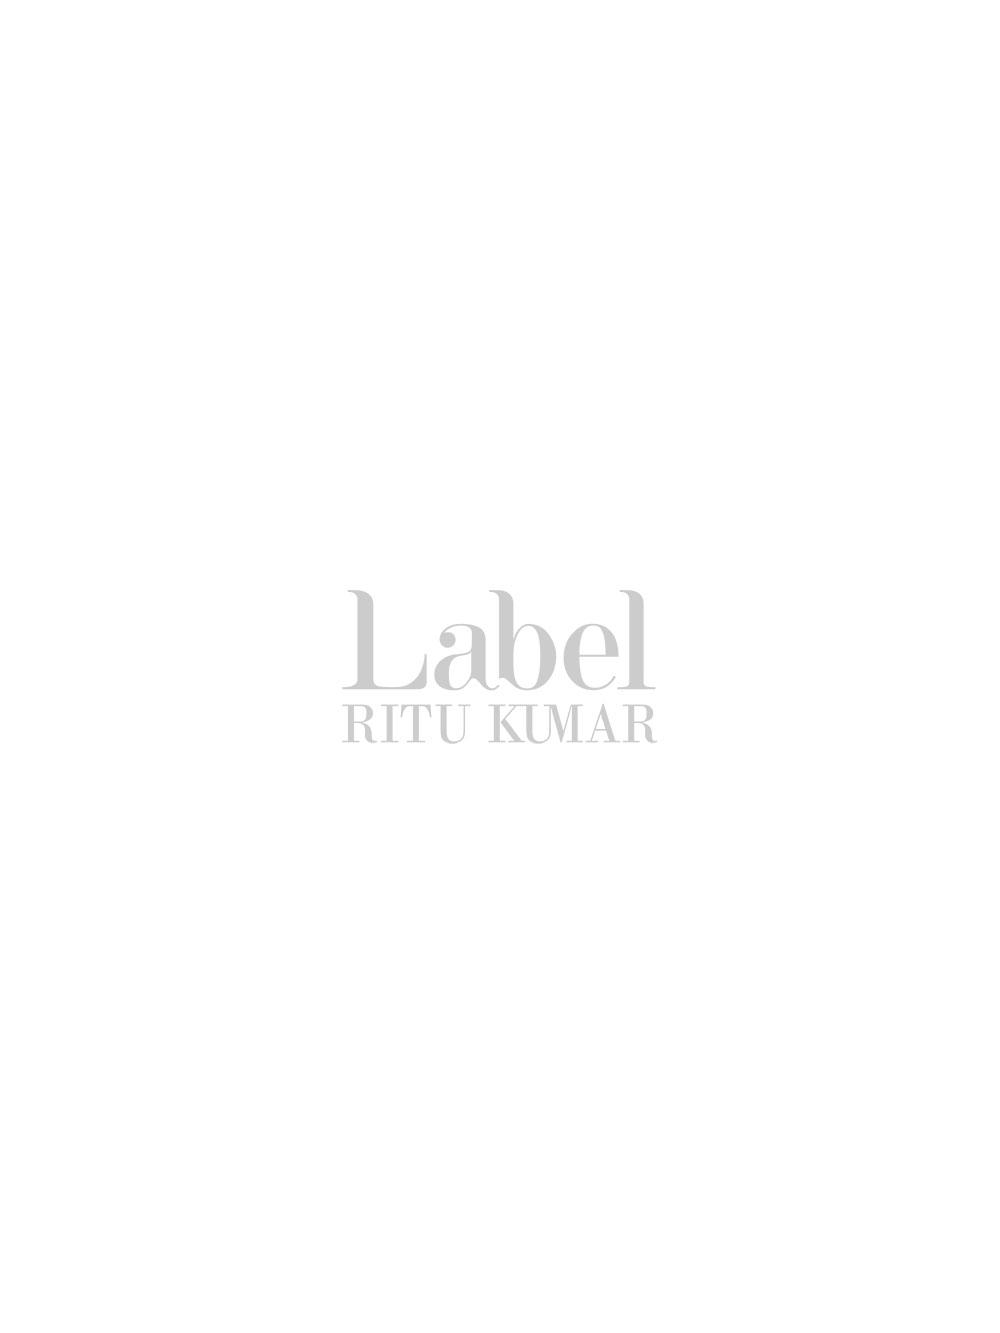 Diana's Charcoal Grey Embellished Bomber Jacket